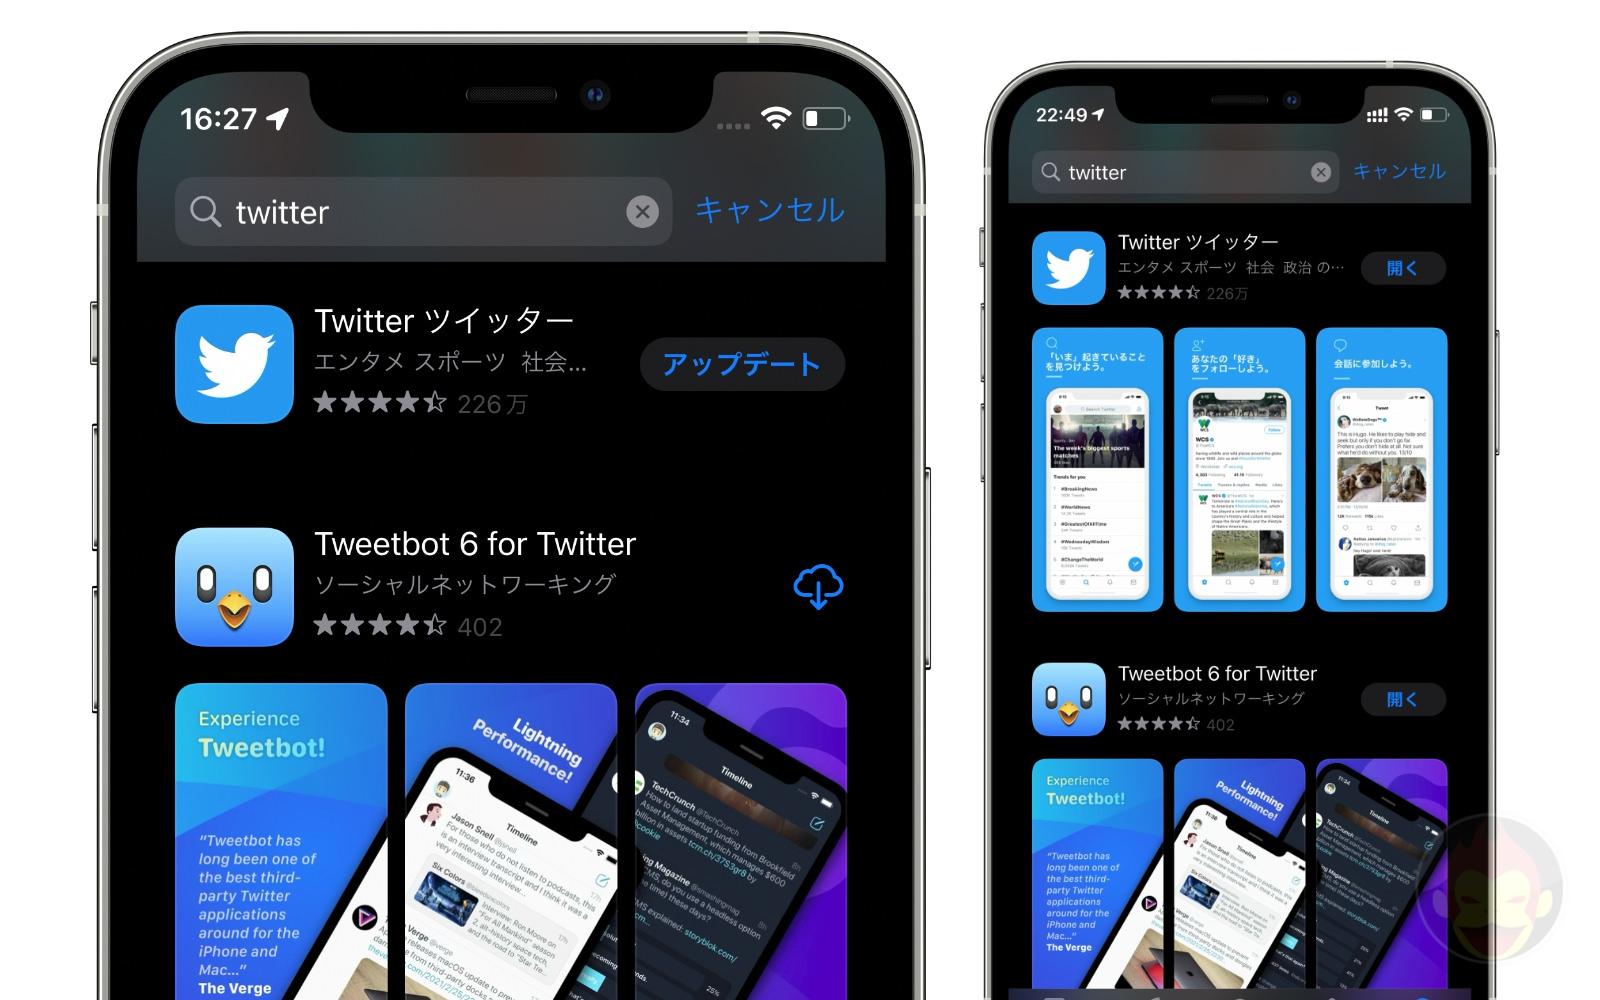 IOS15 app store screenshots